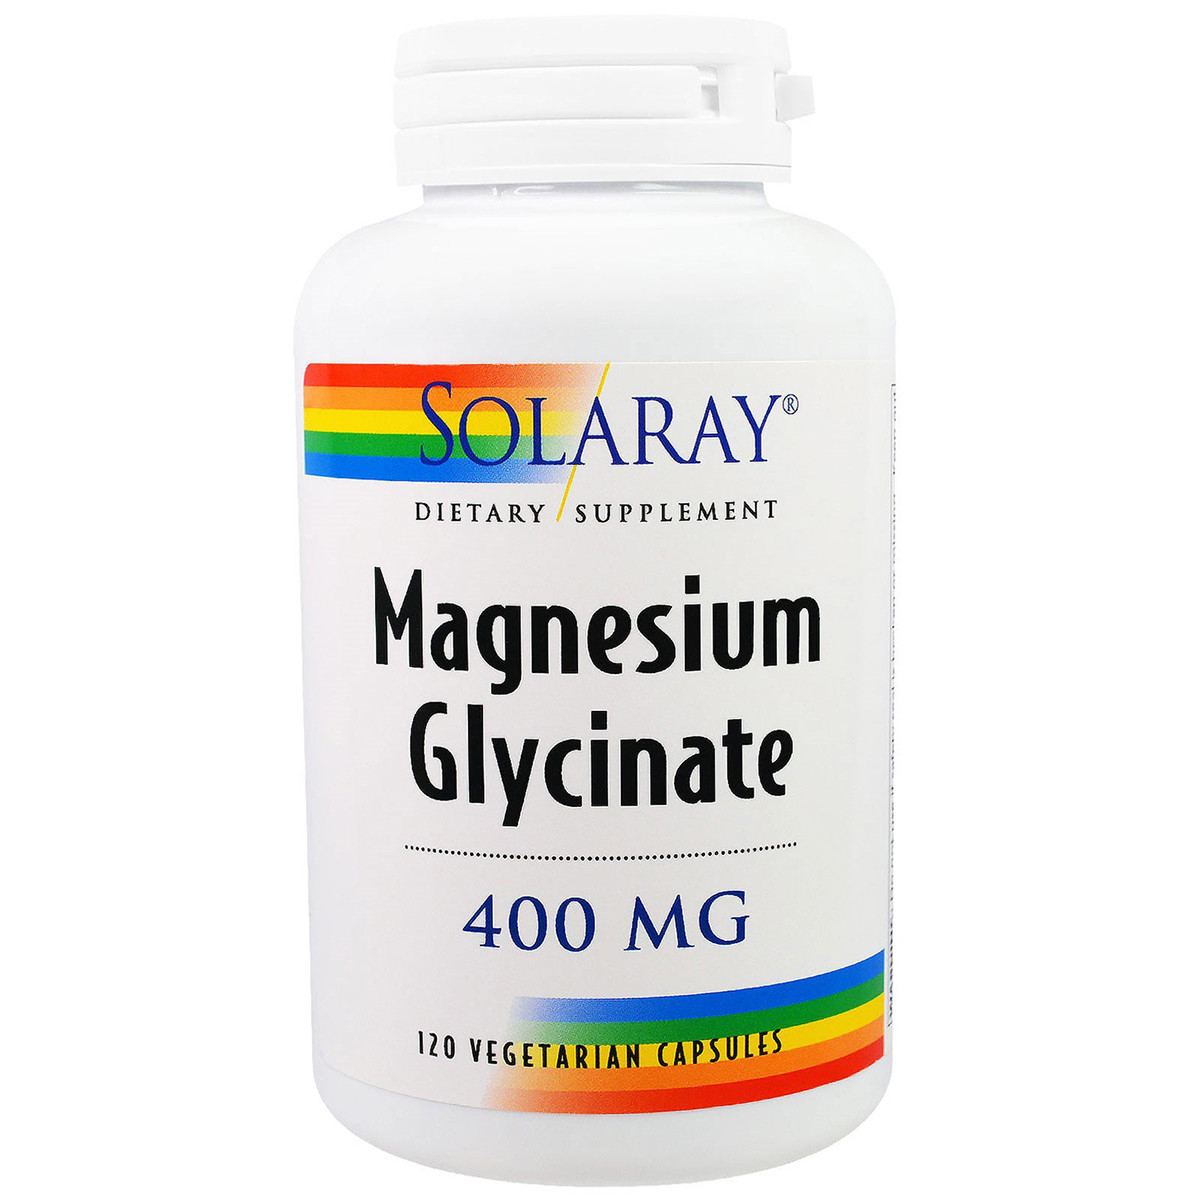 Магний Глицинат, Magnesium Glycinate, Solaray, 400 мг, 120 вегетарианских капсул